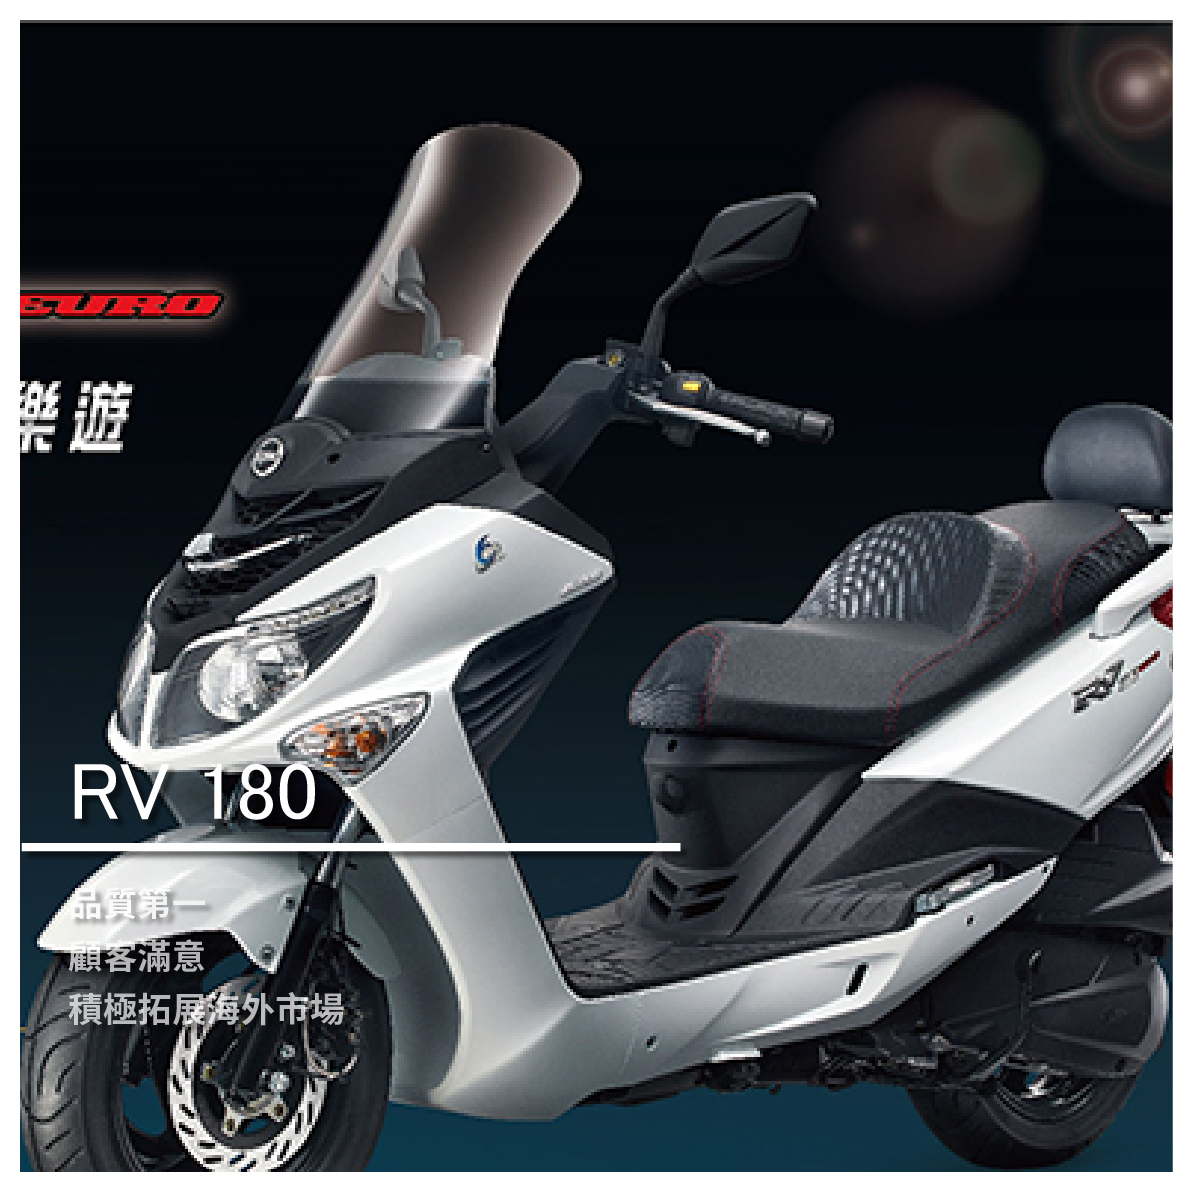 【鋐安車業】SYM 三陽系列 RV 180 EURO